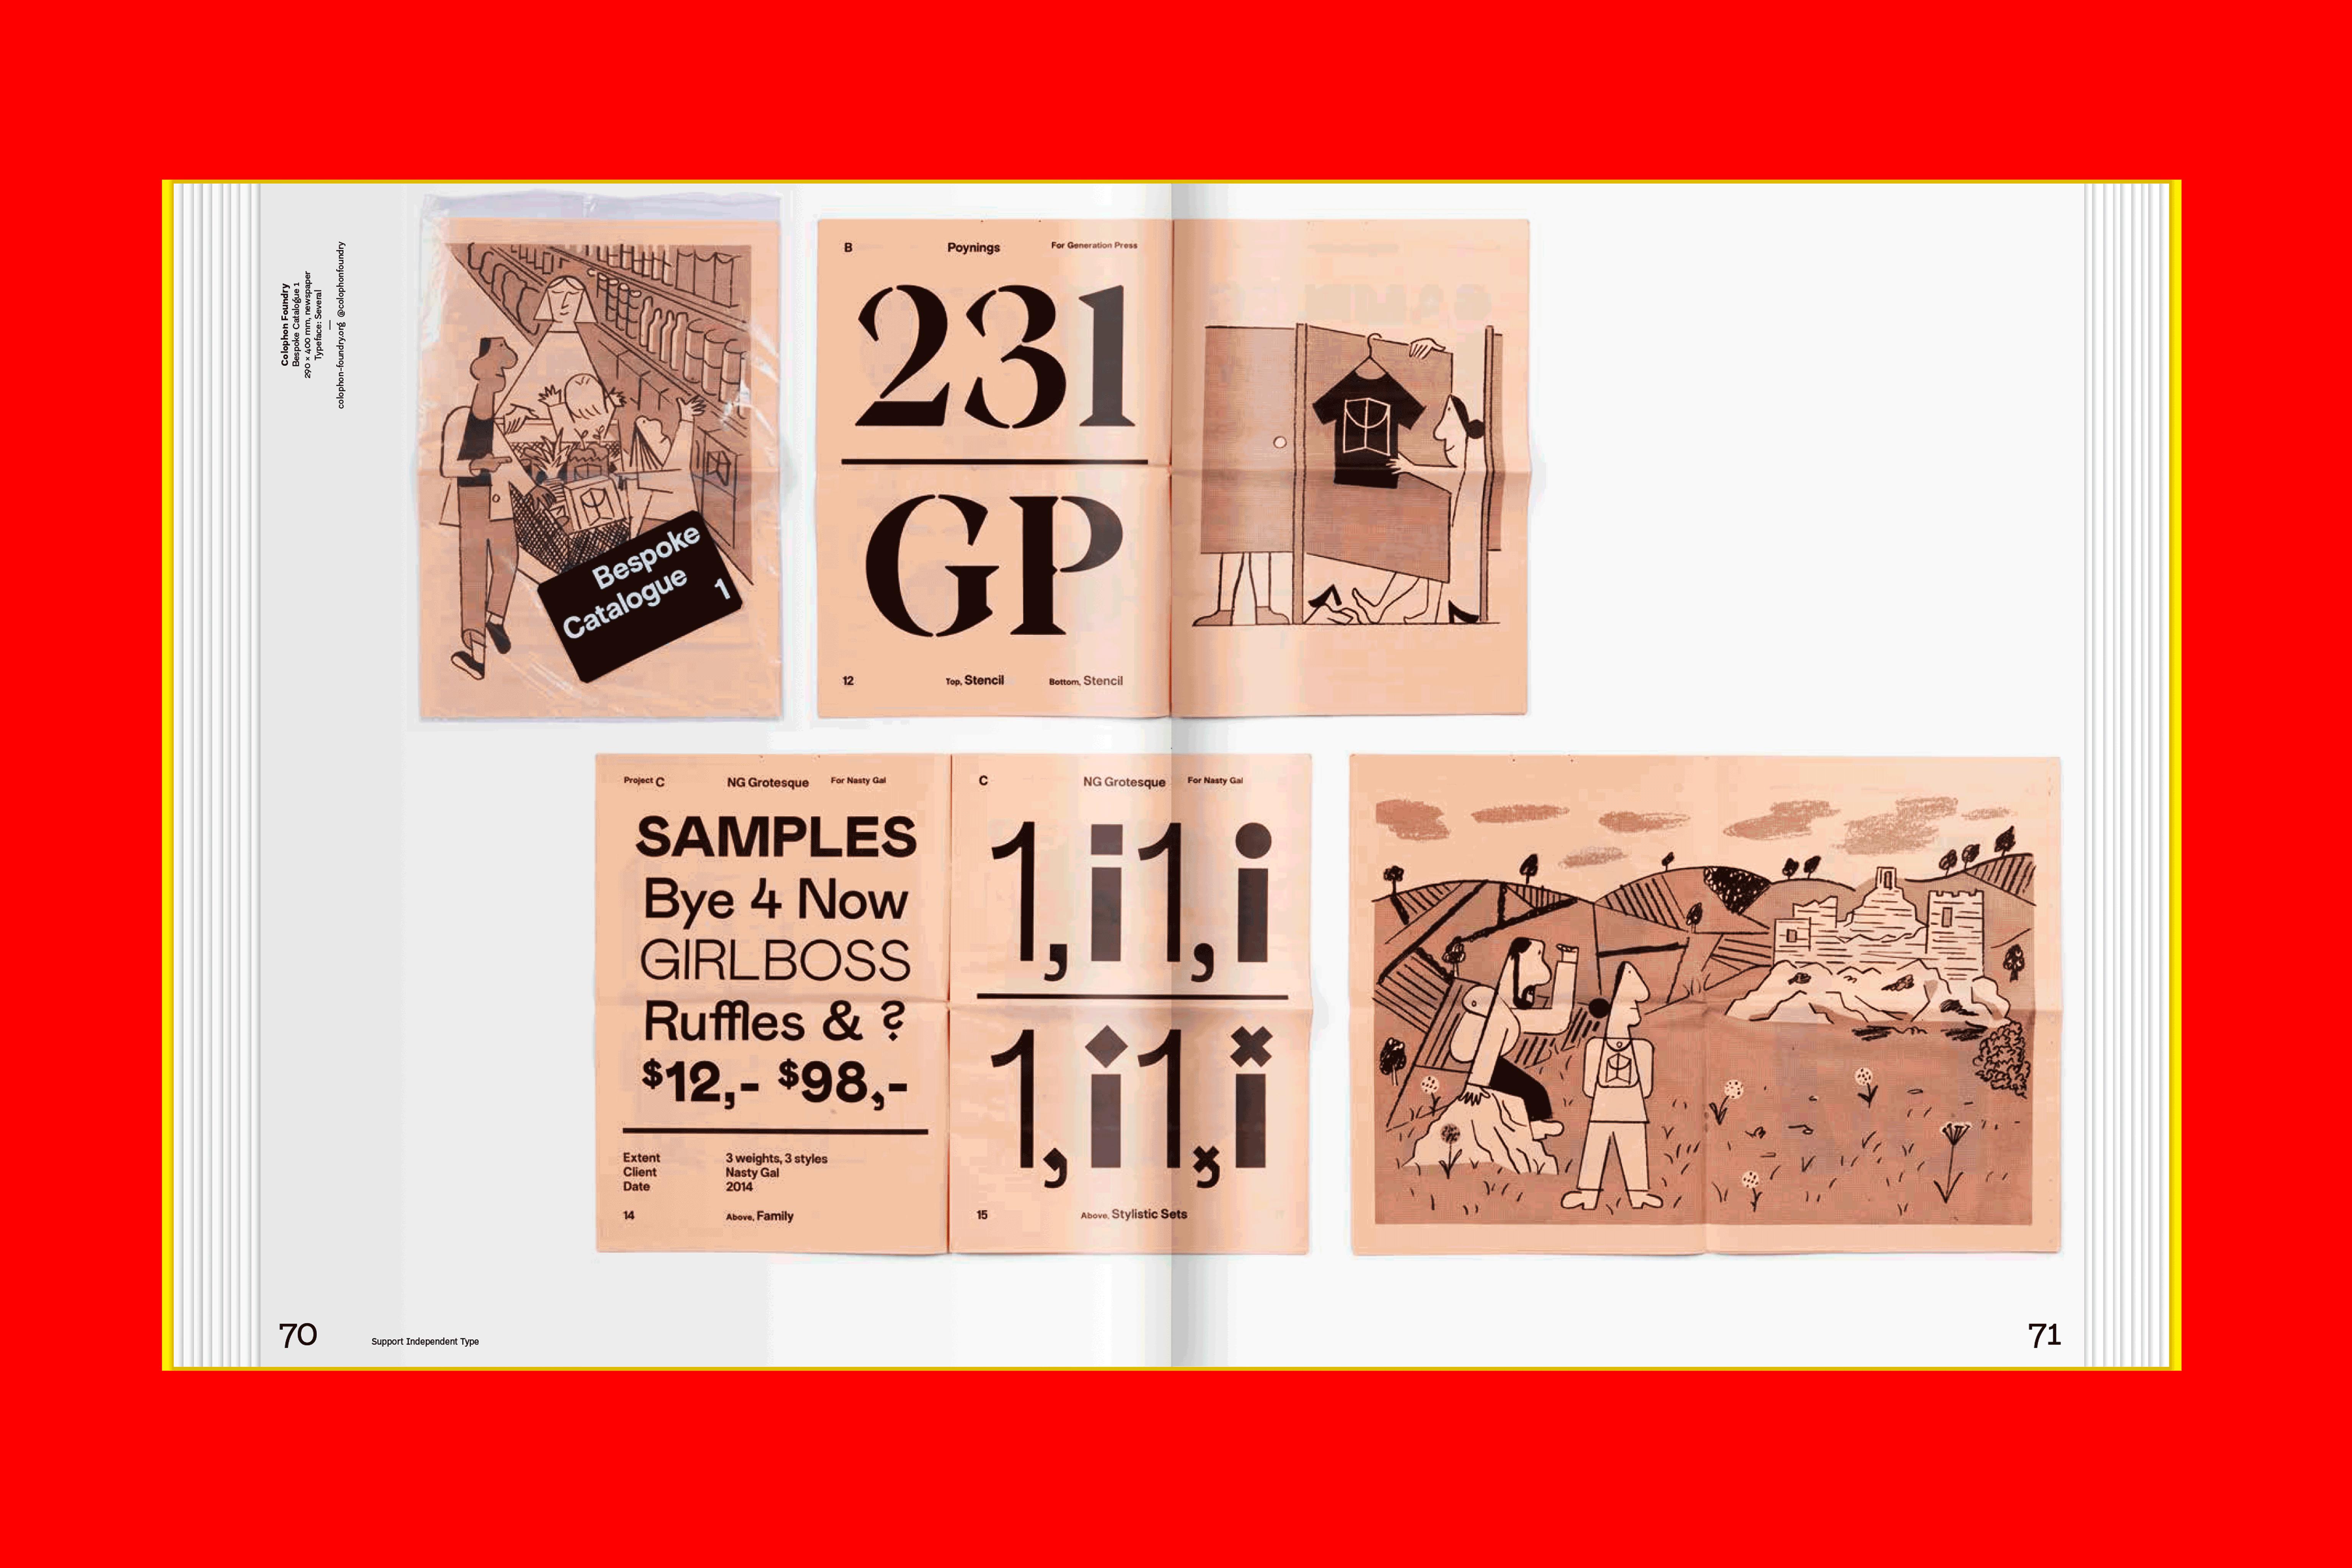 Slanted-Publiaktionen-Slanted-Publishers-Support-Independent-Type_16